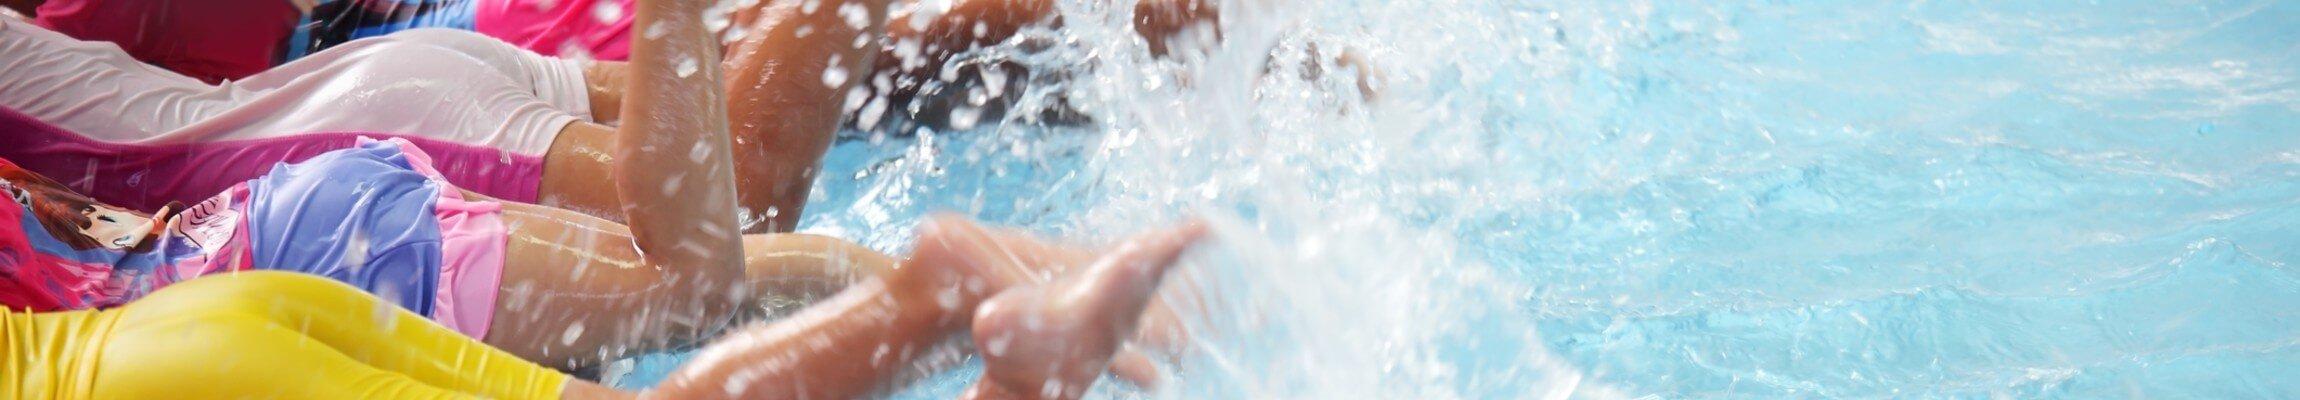 swim clinic kicking practice